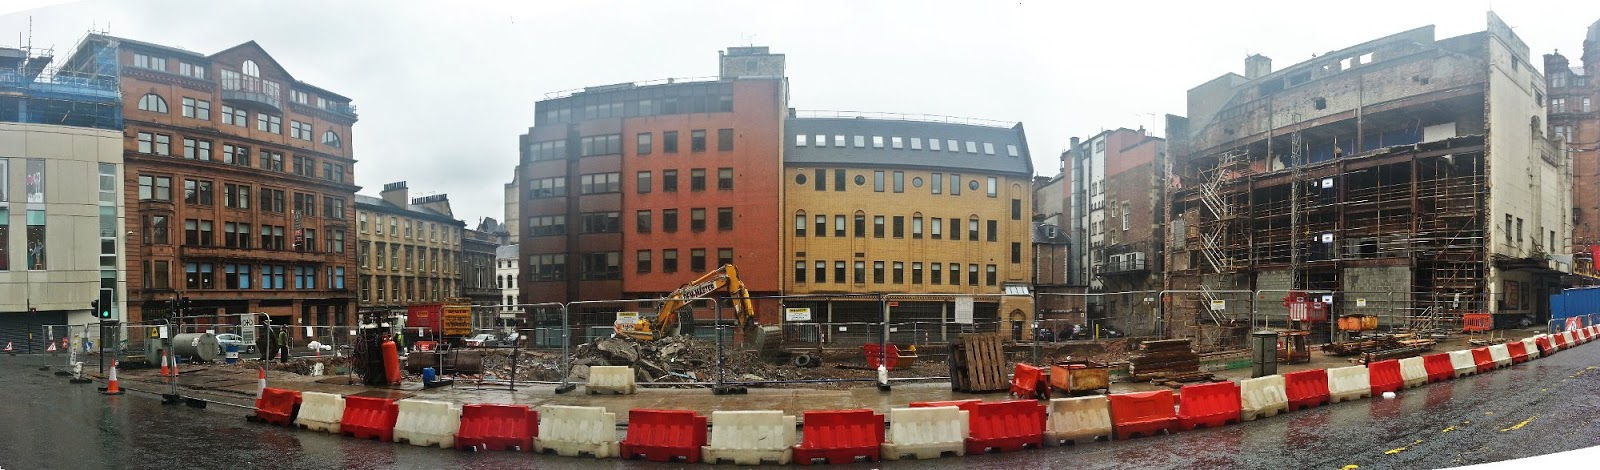 Demolished Odeon cinema, Glasgow